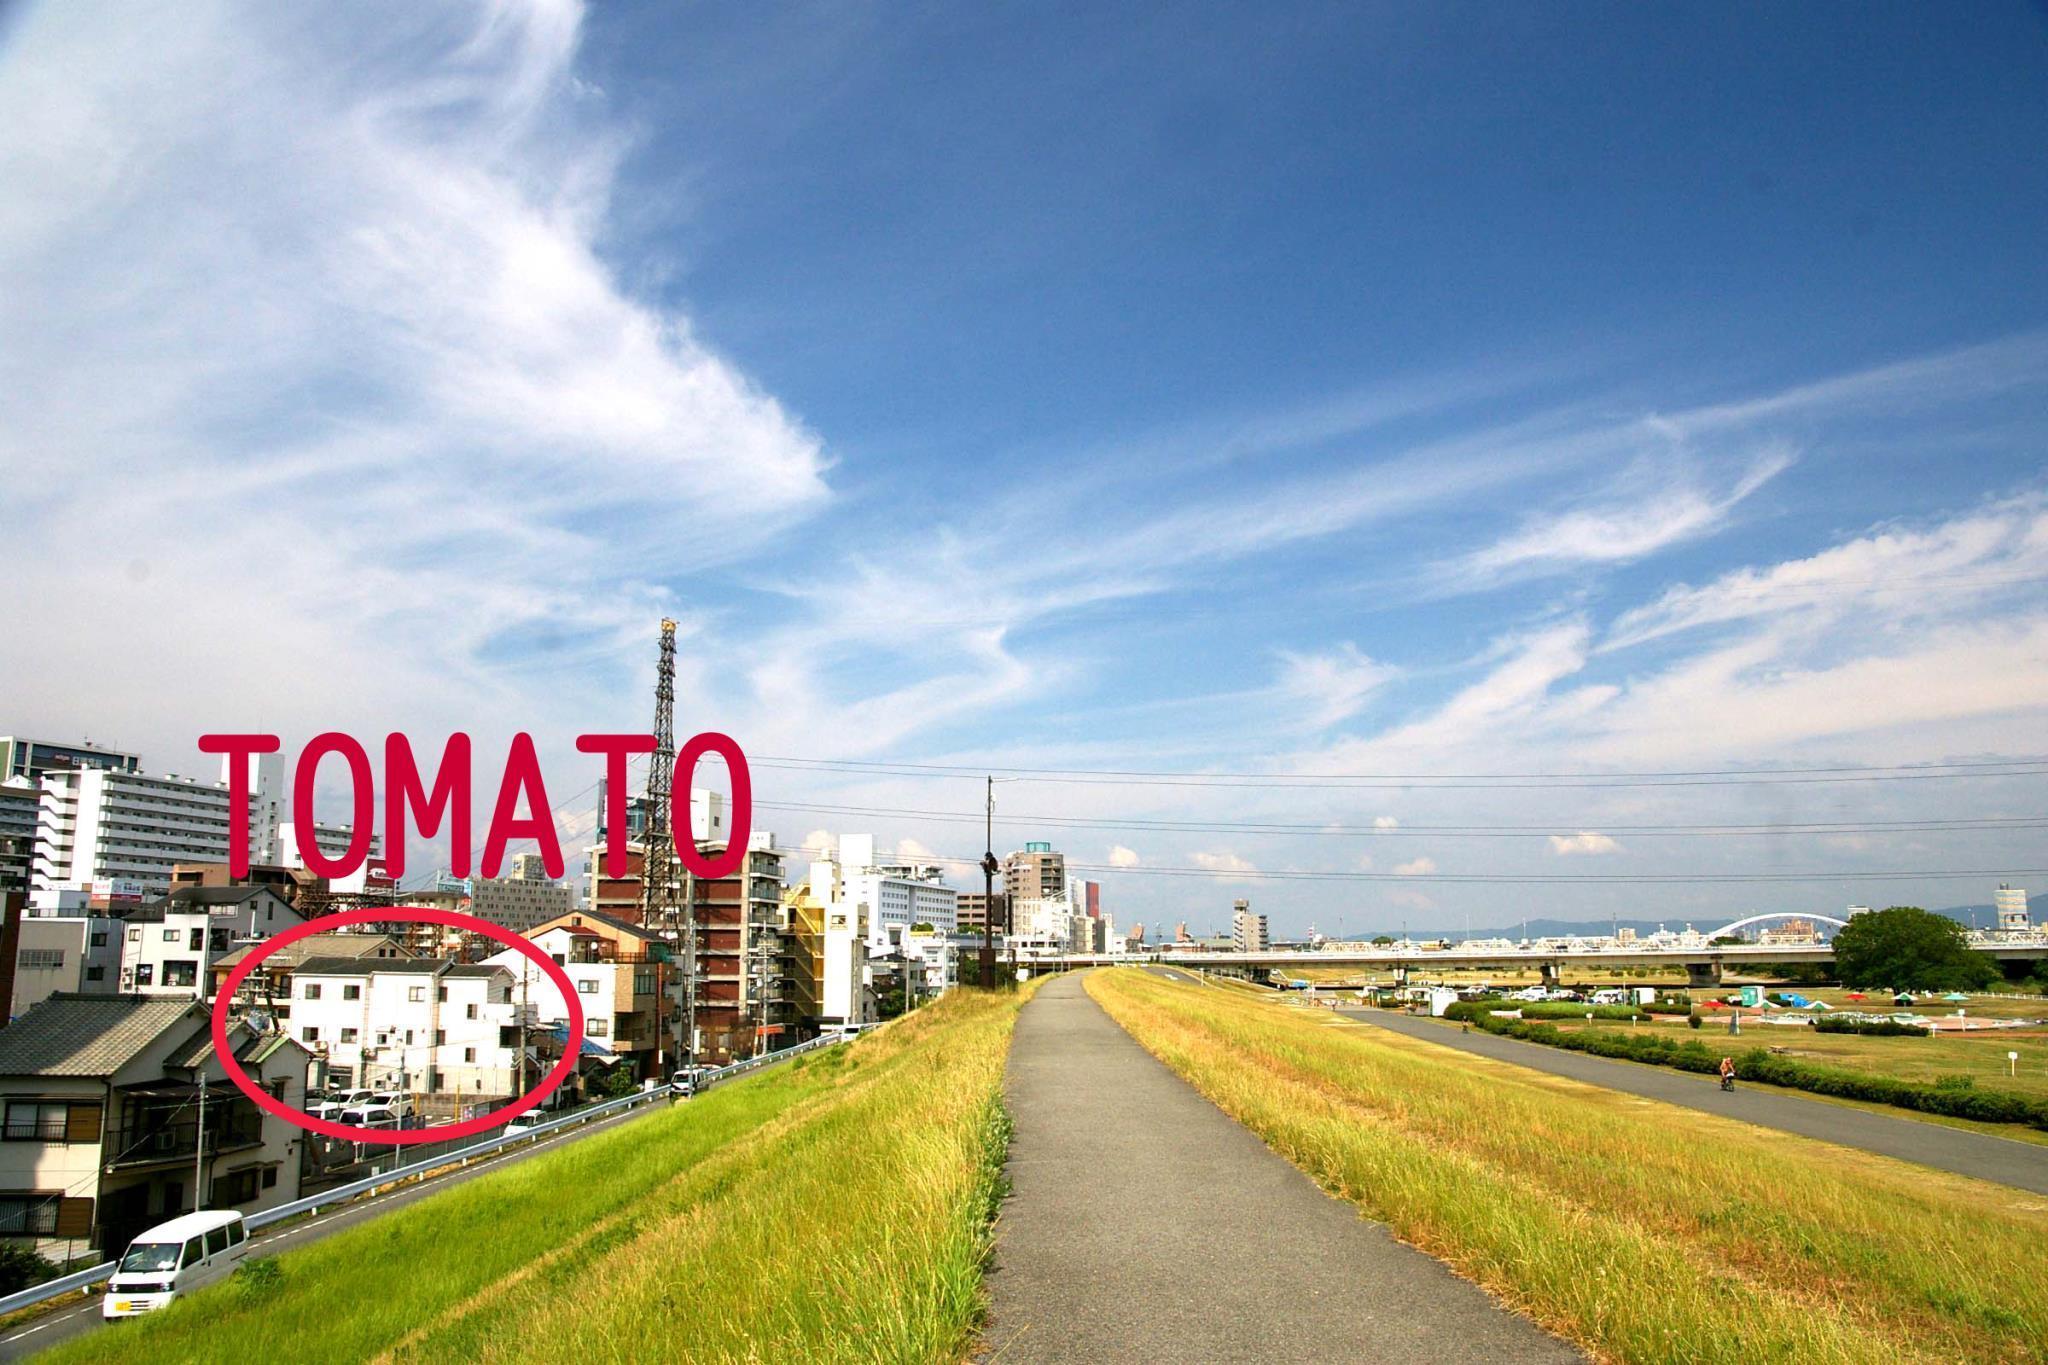 大阪番茄旅館 Osaka Tomato Hostel